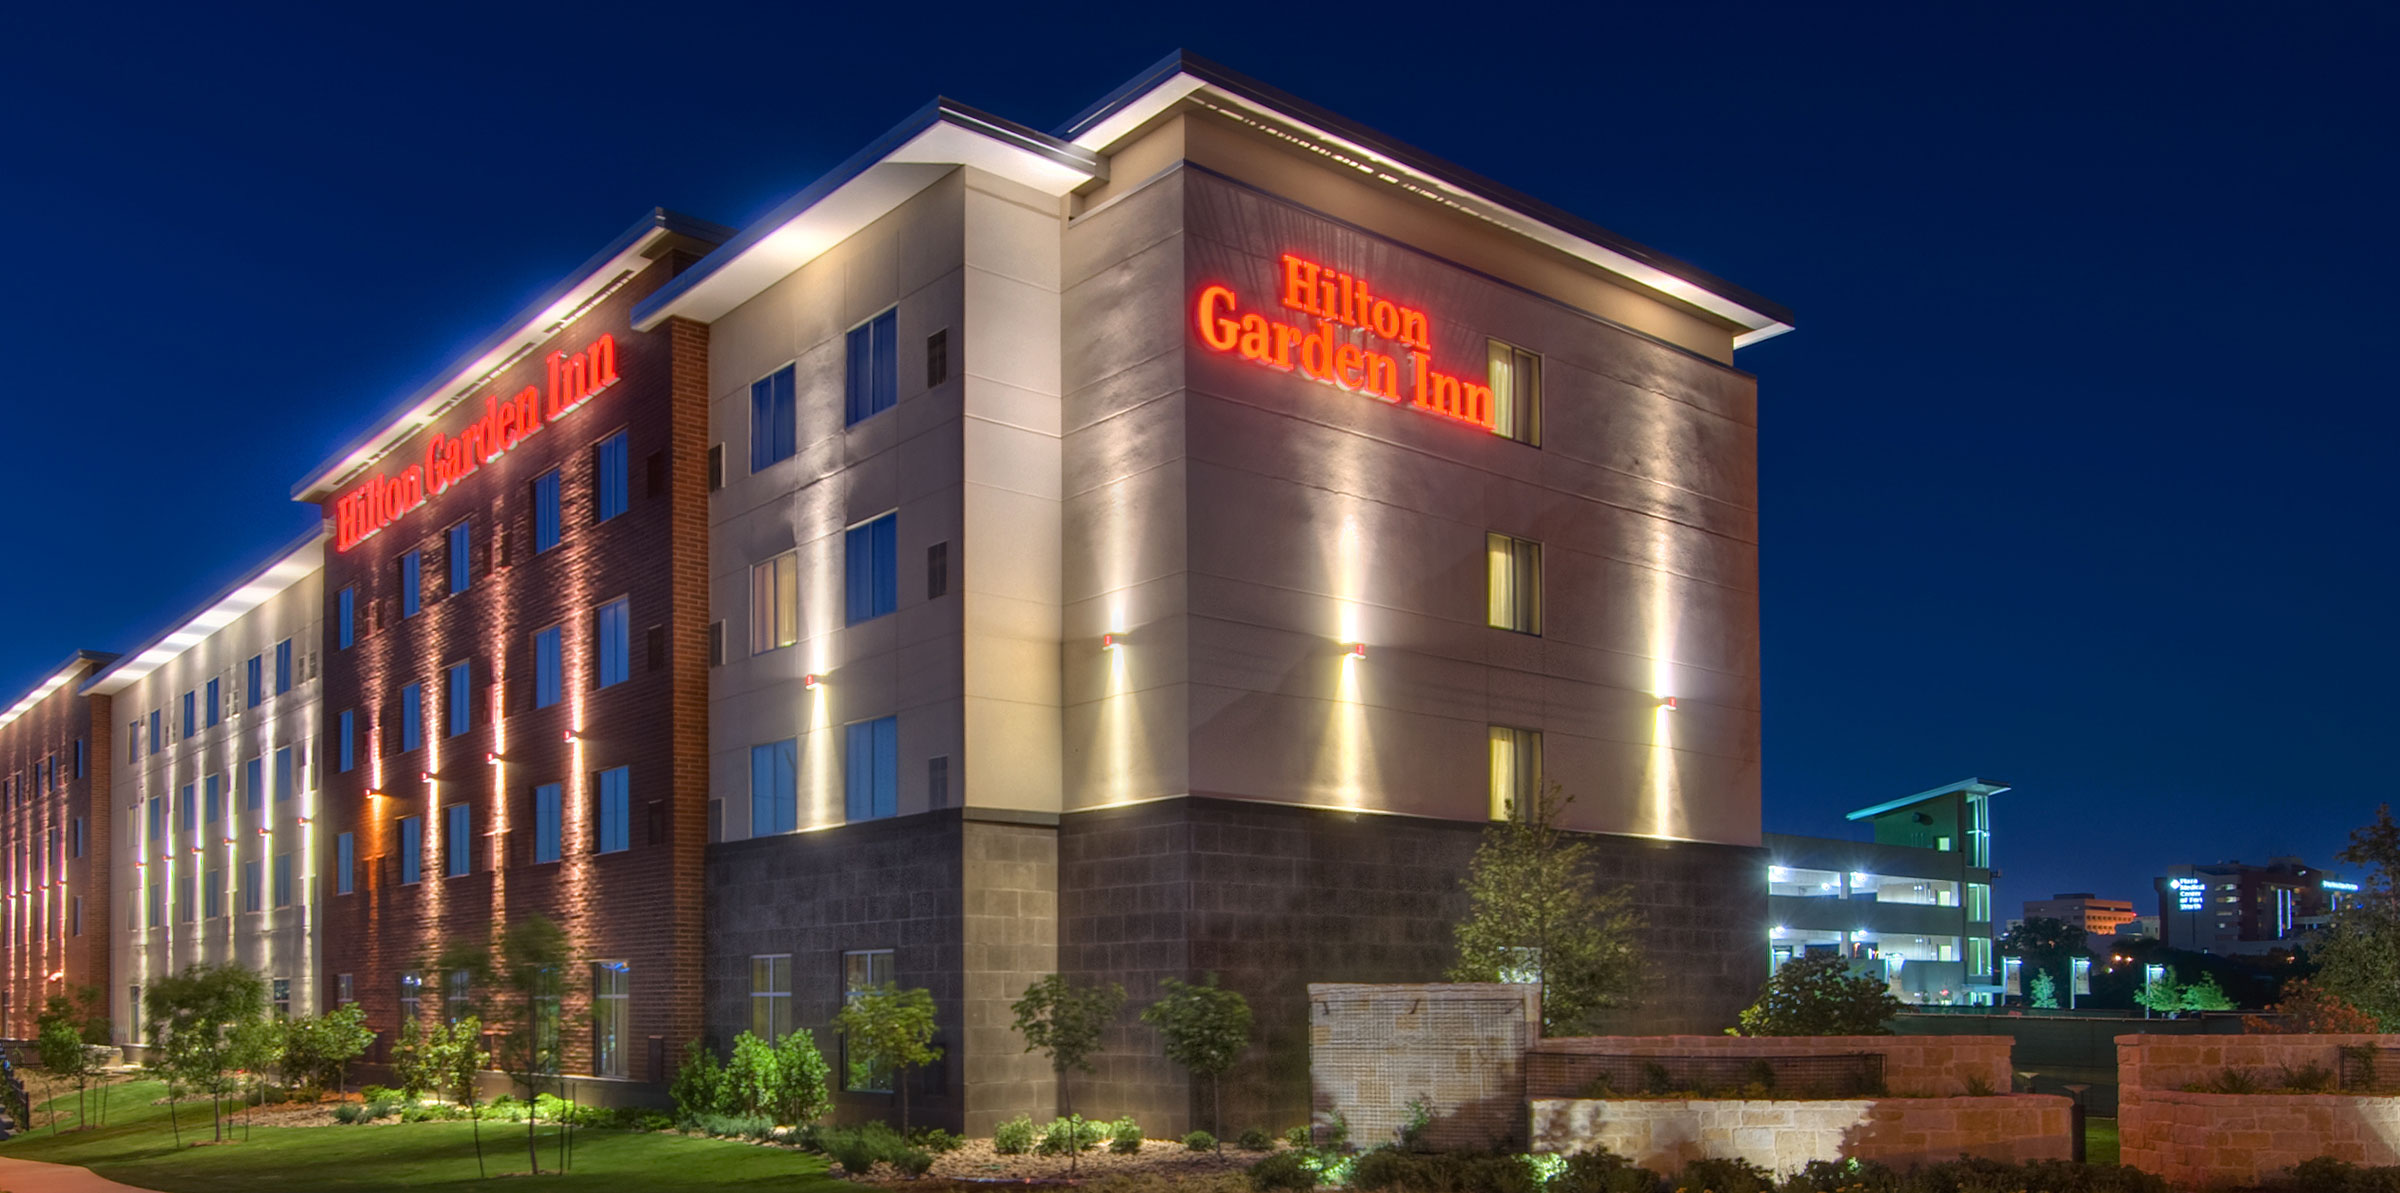 Hilton Garden Inn Ft Worth Tx Gba Architecture And Design